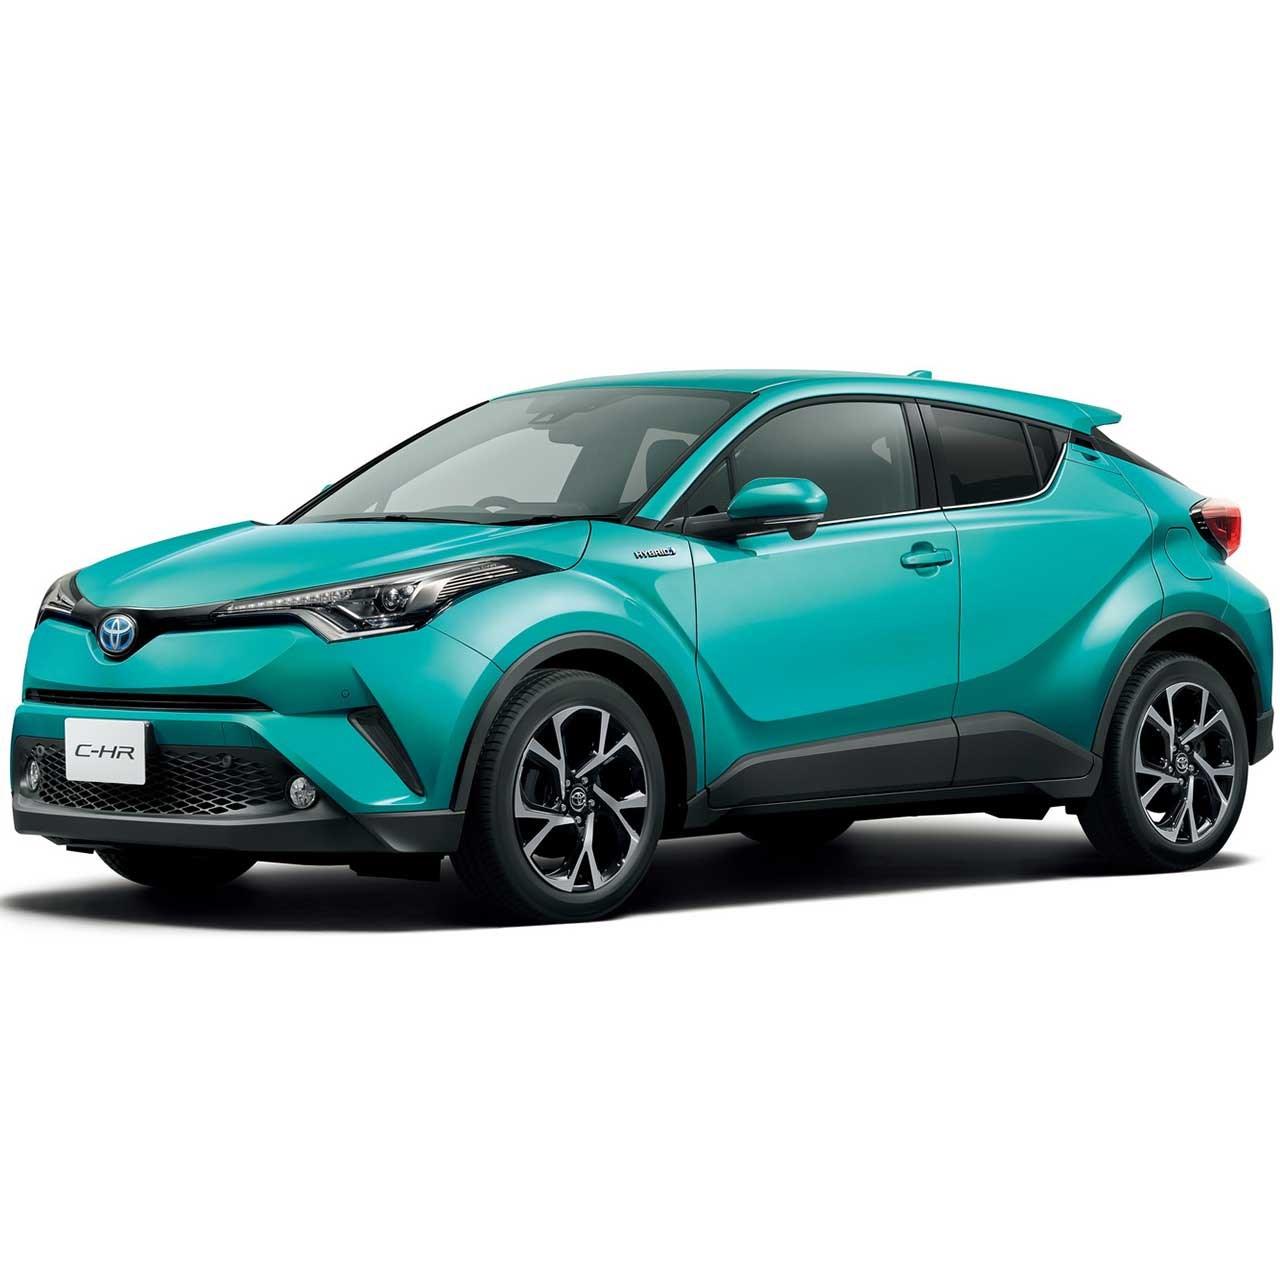 خودرو تویوتا C-HR اتوماتیک سال 2017